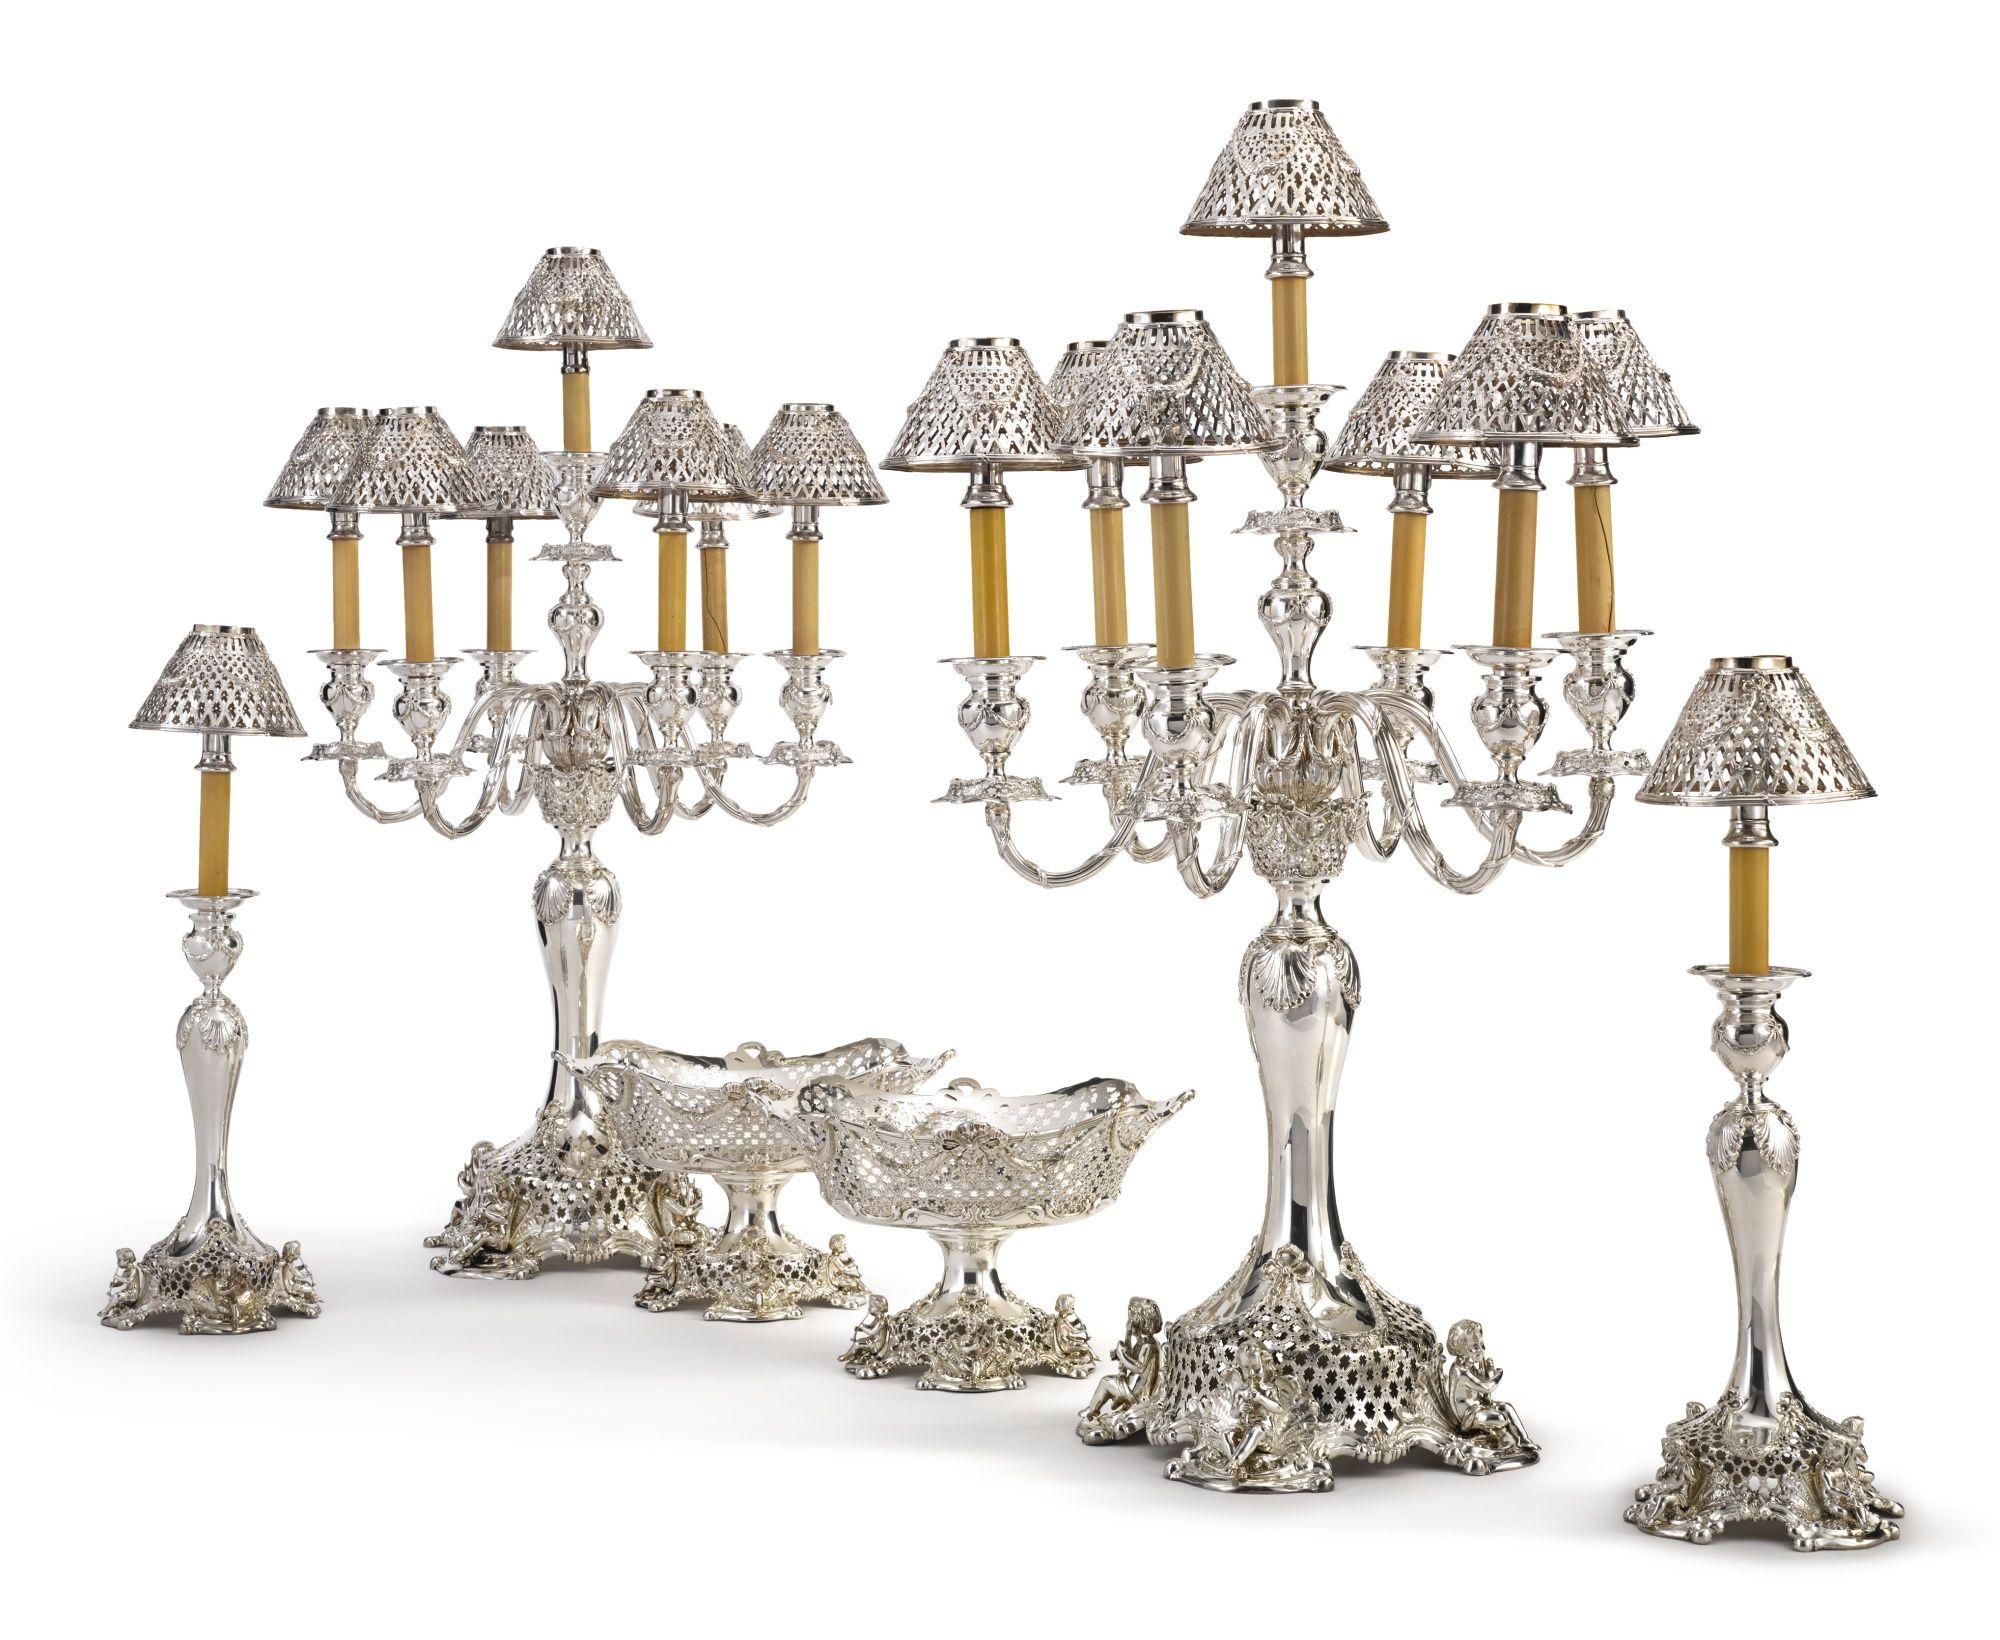 An American silver table garniture, Howard & Co., New York